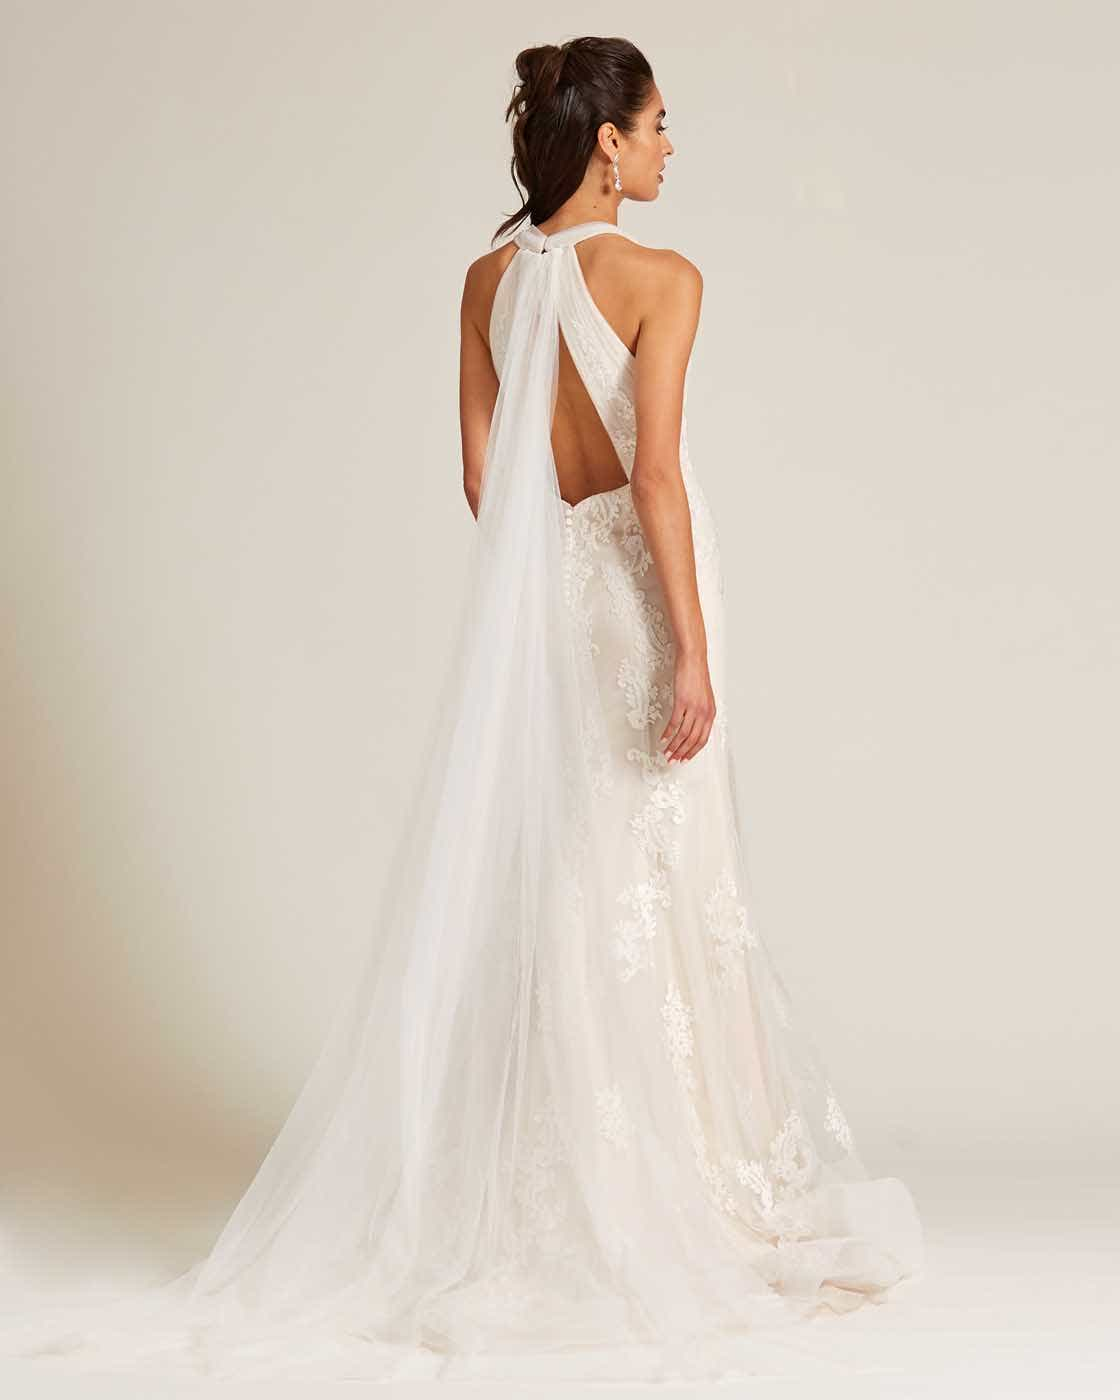 White Plunging V Neck Line Wedding Gown - Back